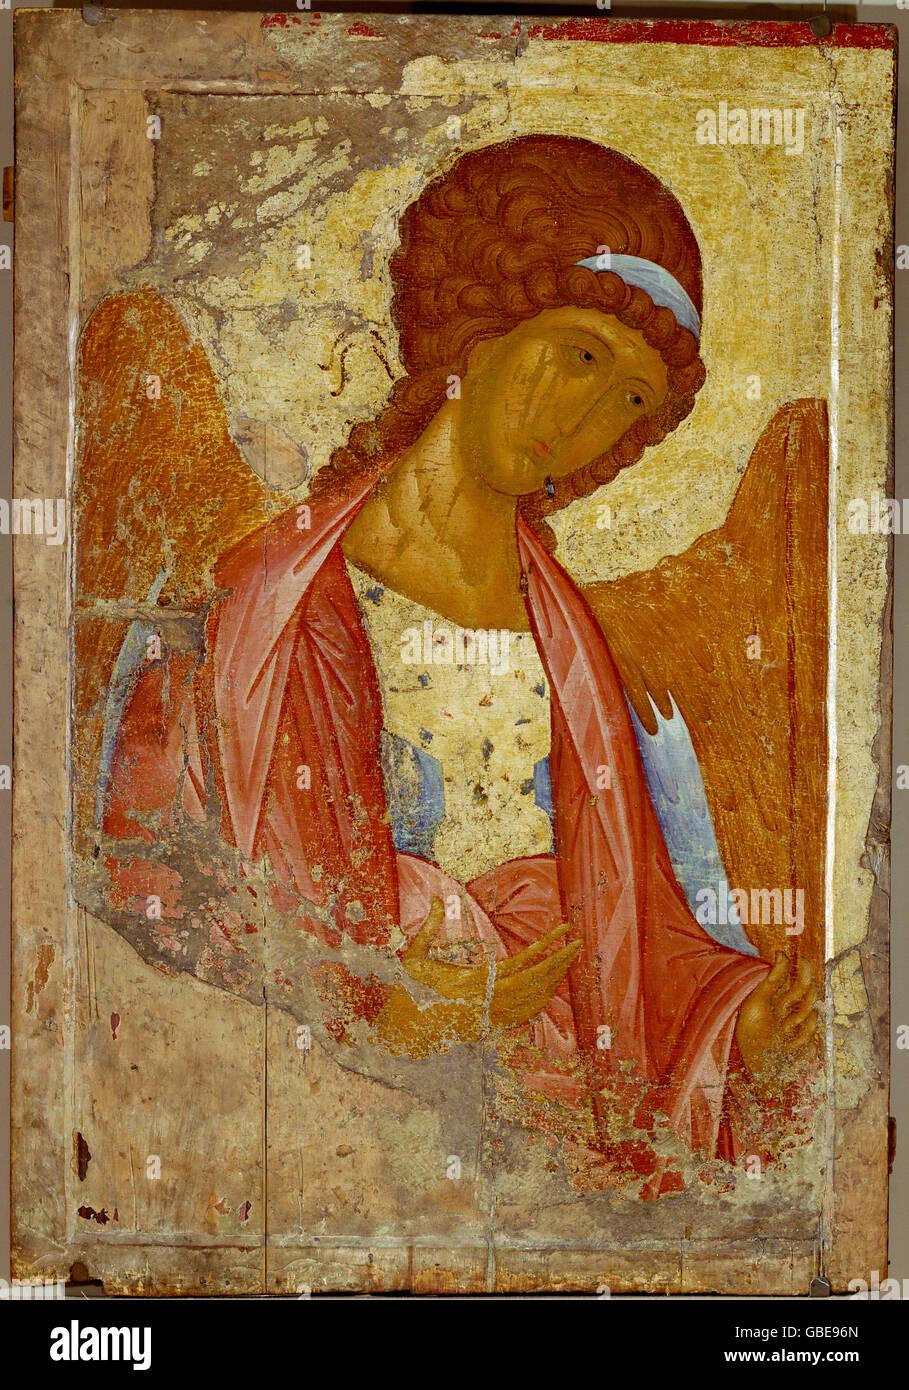 fine arts, Rublev, Andrei (circa 1360 - 1430), painting, 'Archangel Michael', icon, tempera on wood, circa - Stock Image